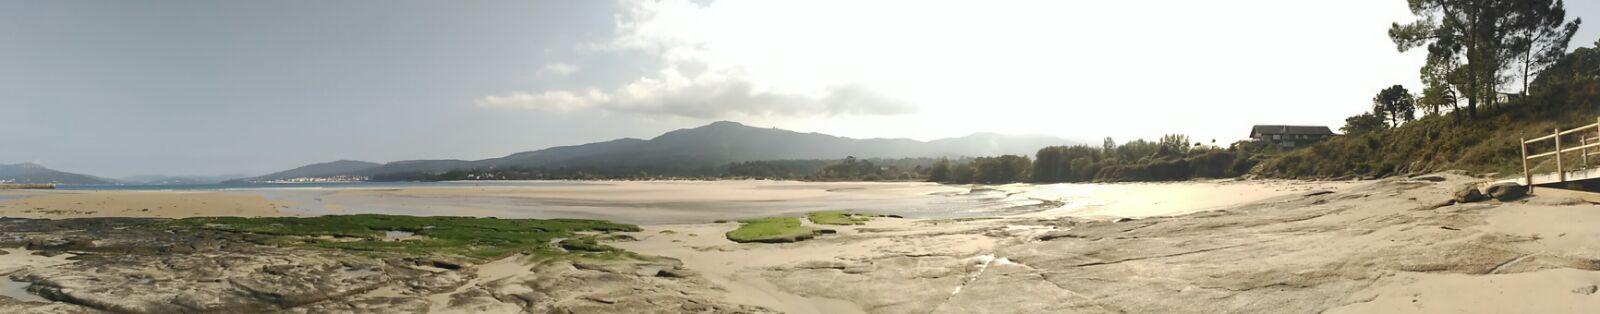 Playa Aigueira-www.milesdetextos.com